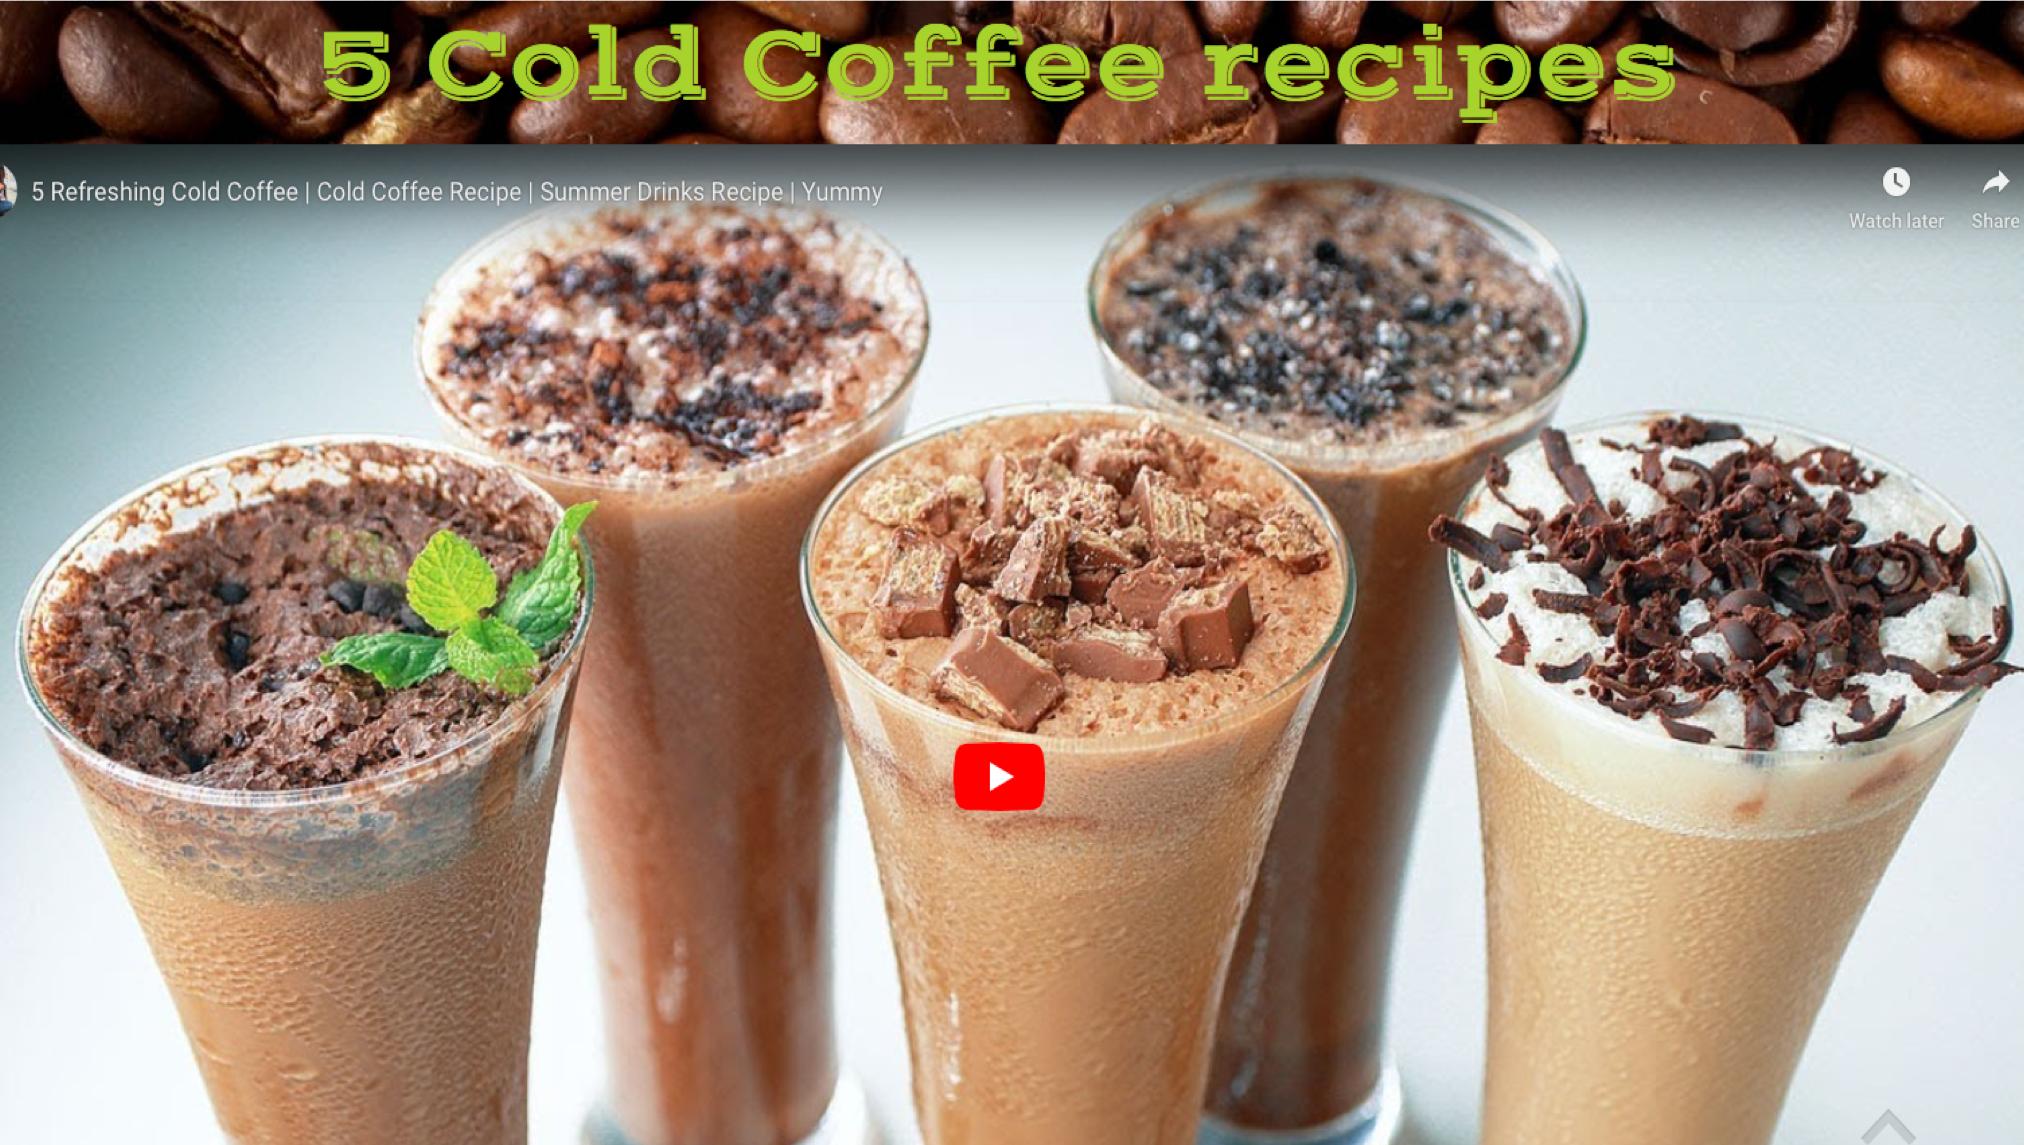 5 Cold Coffee recipes